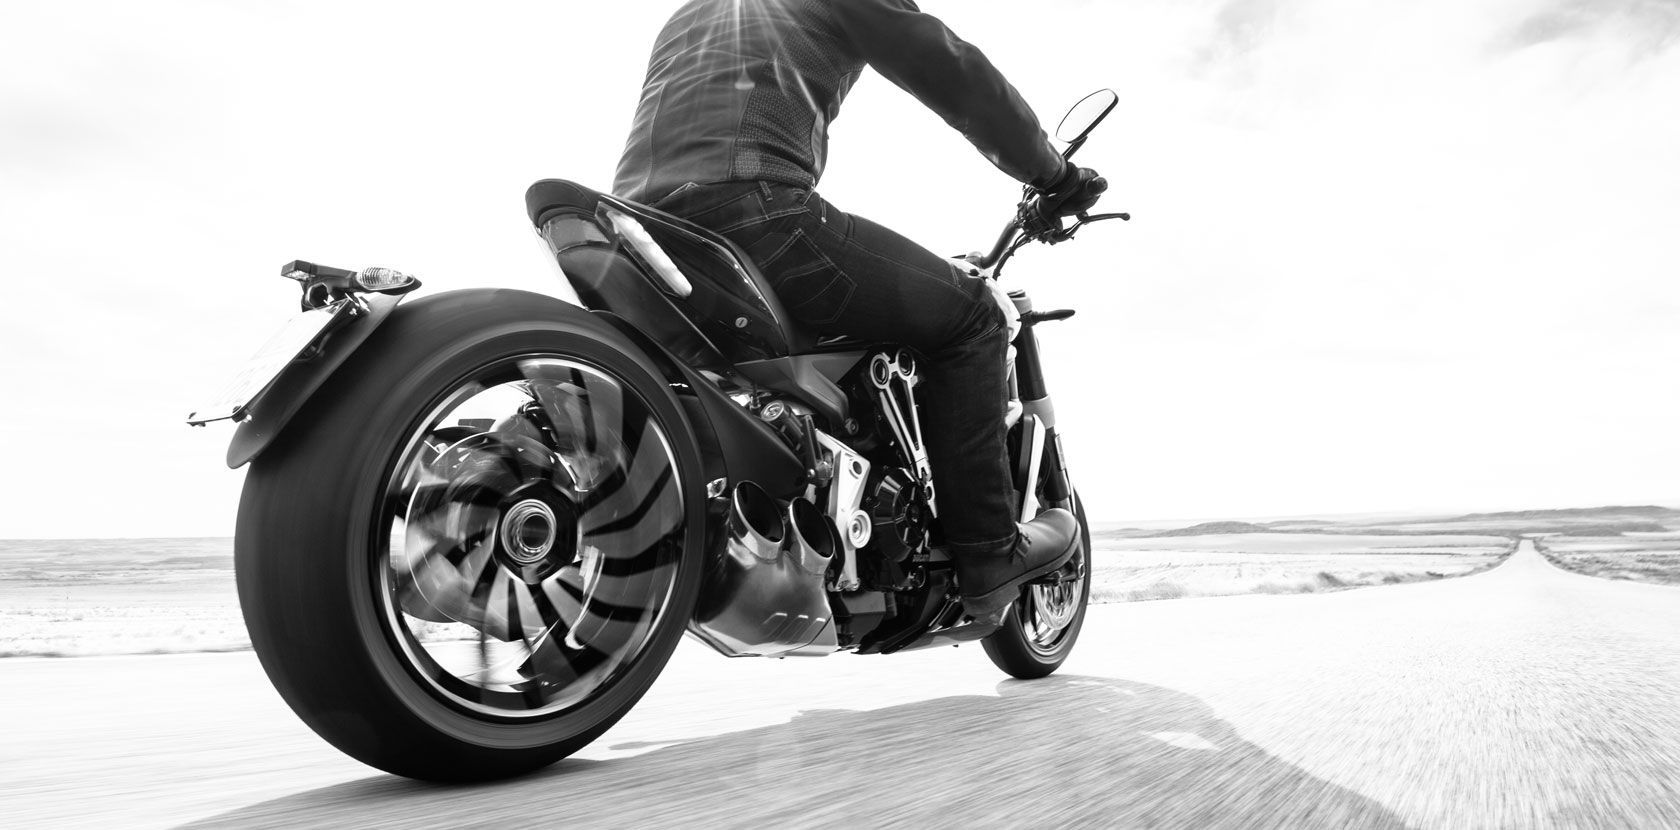 2016 Ducati XDiavel S | XDiavel - Wheel Shot